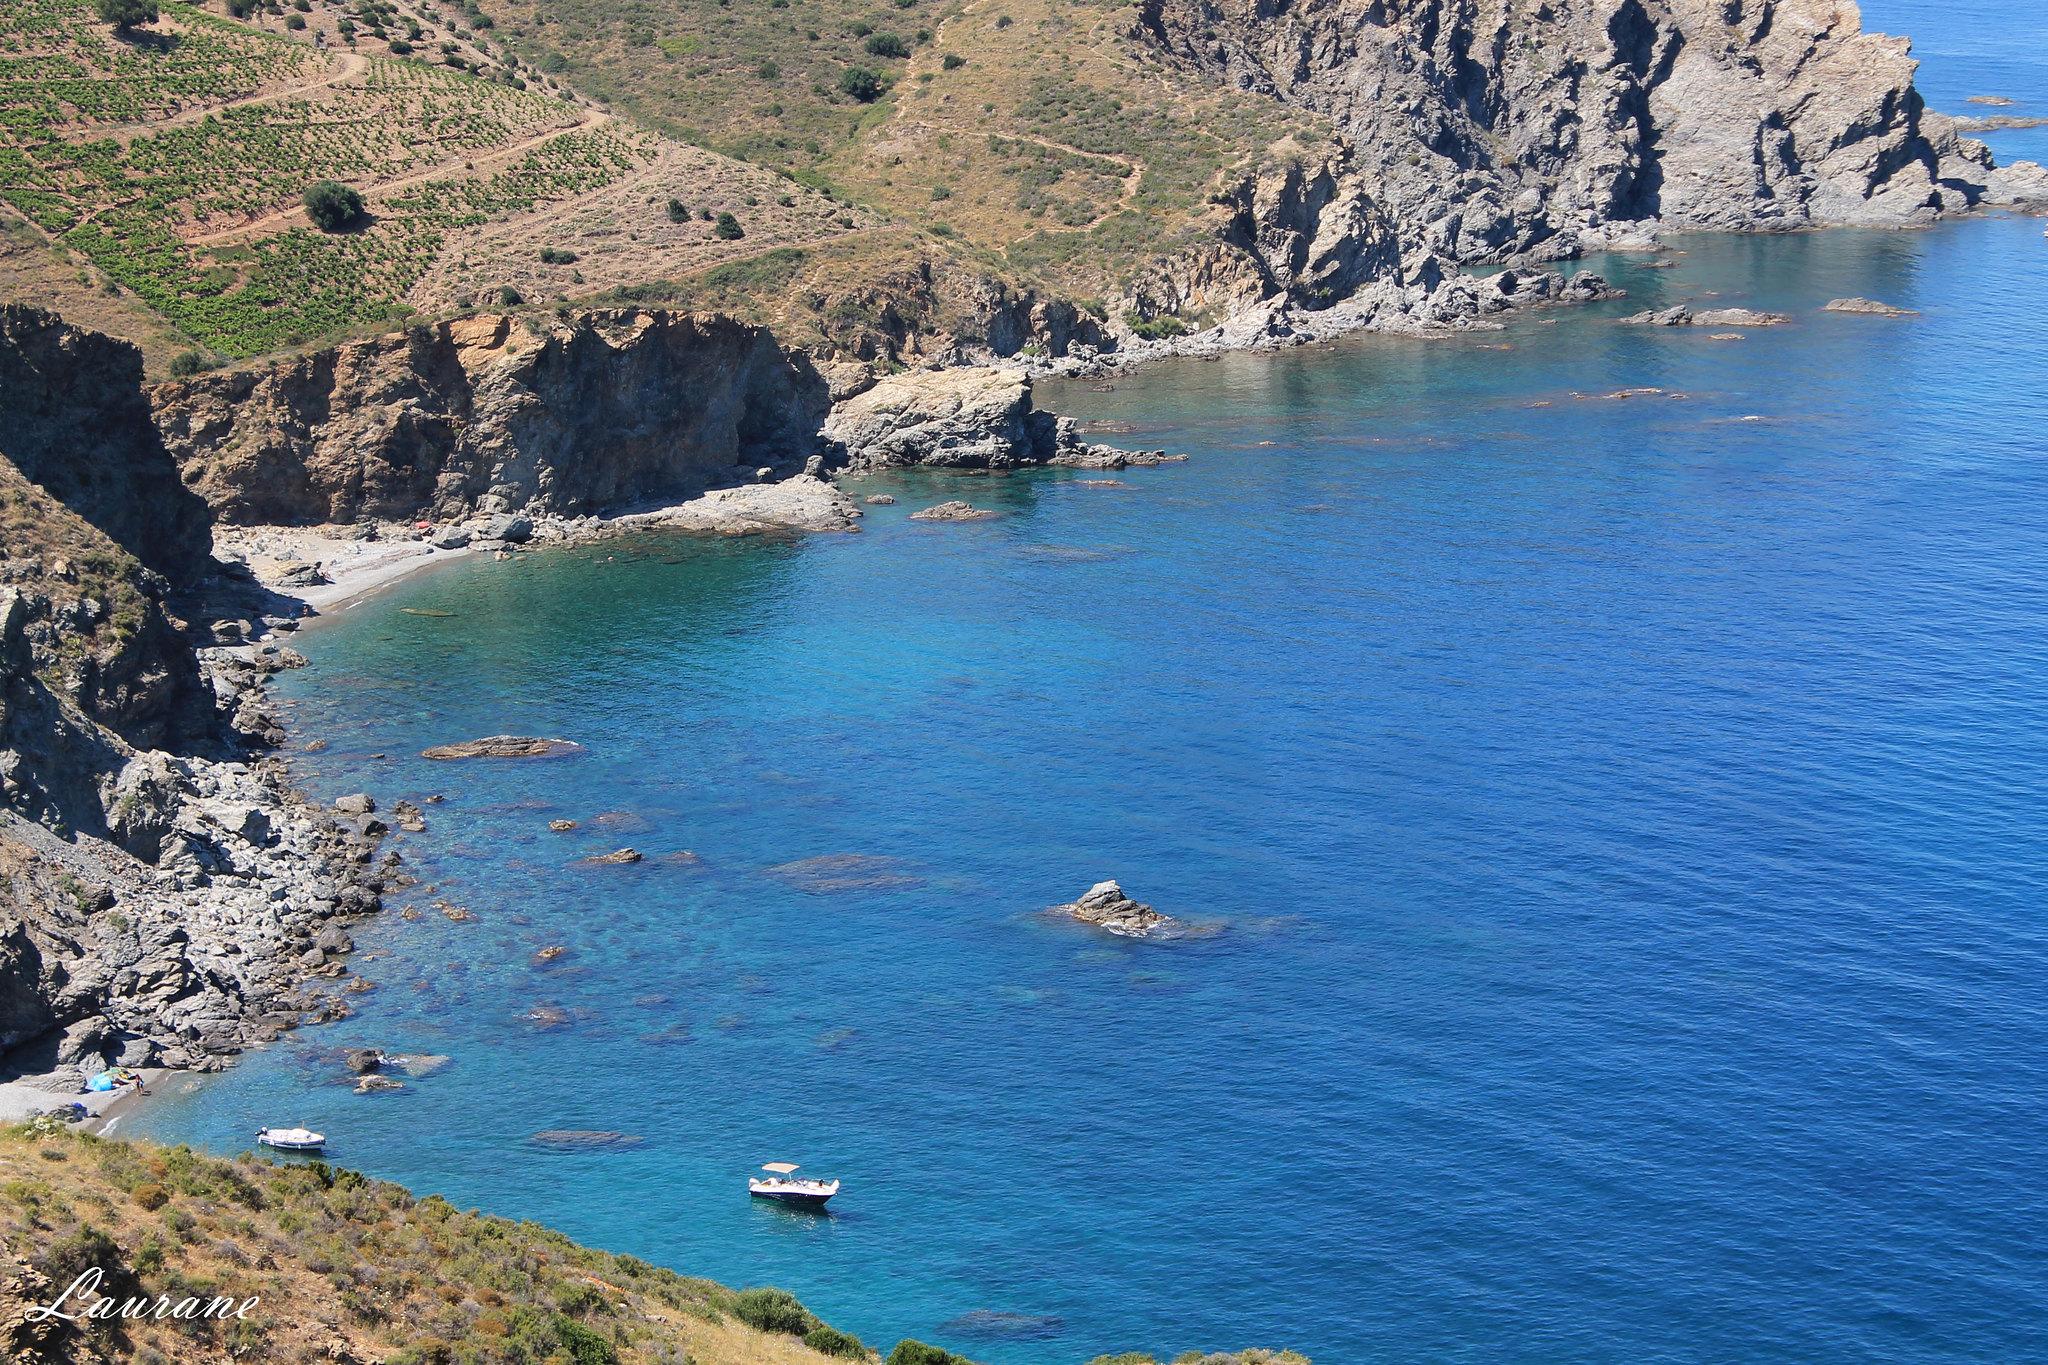 criques sauvages naturelle reserve marine sentier marin